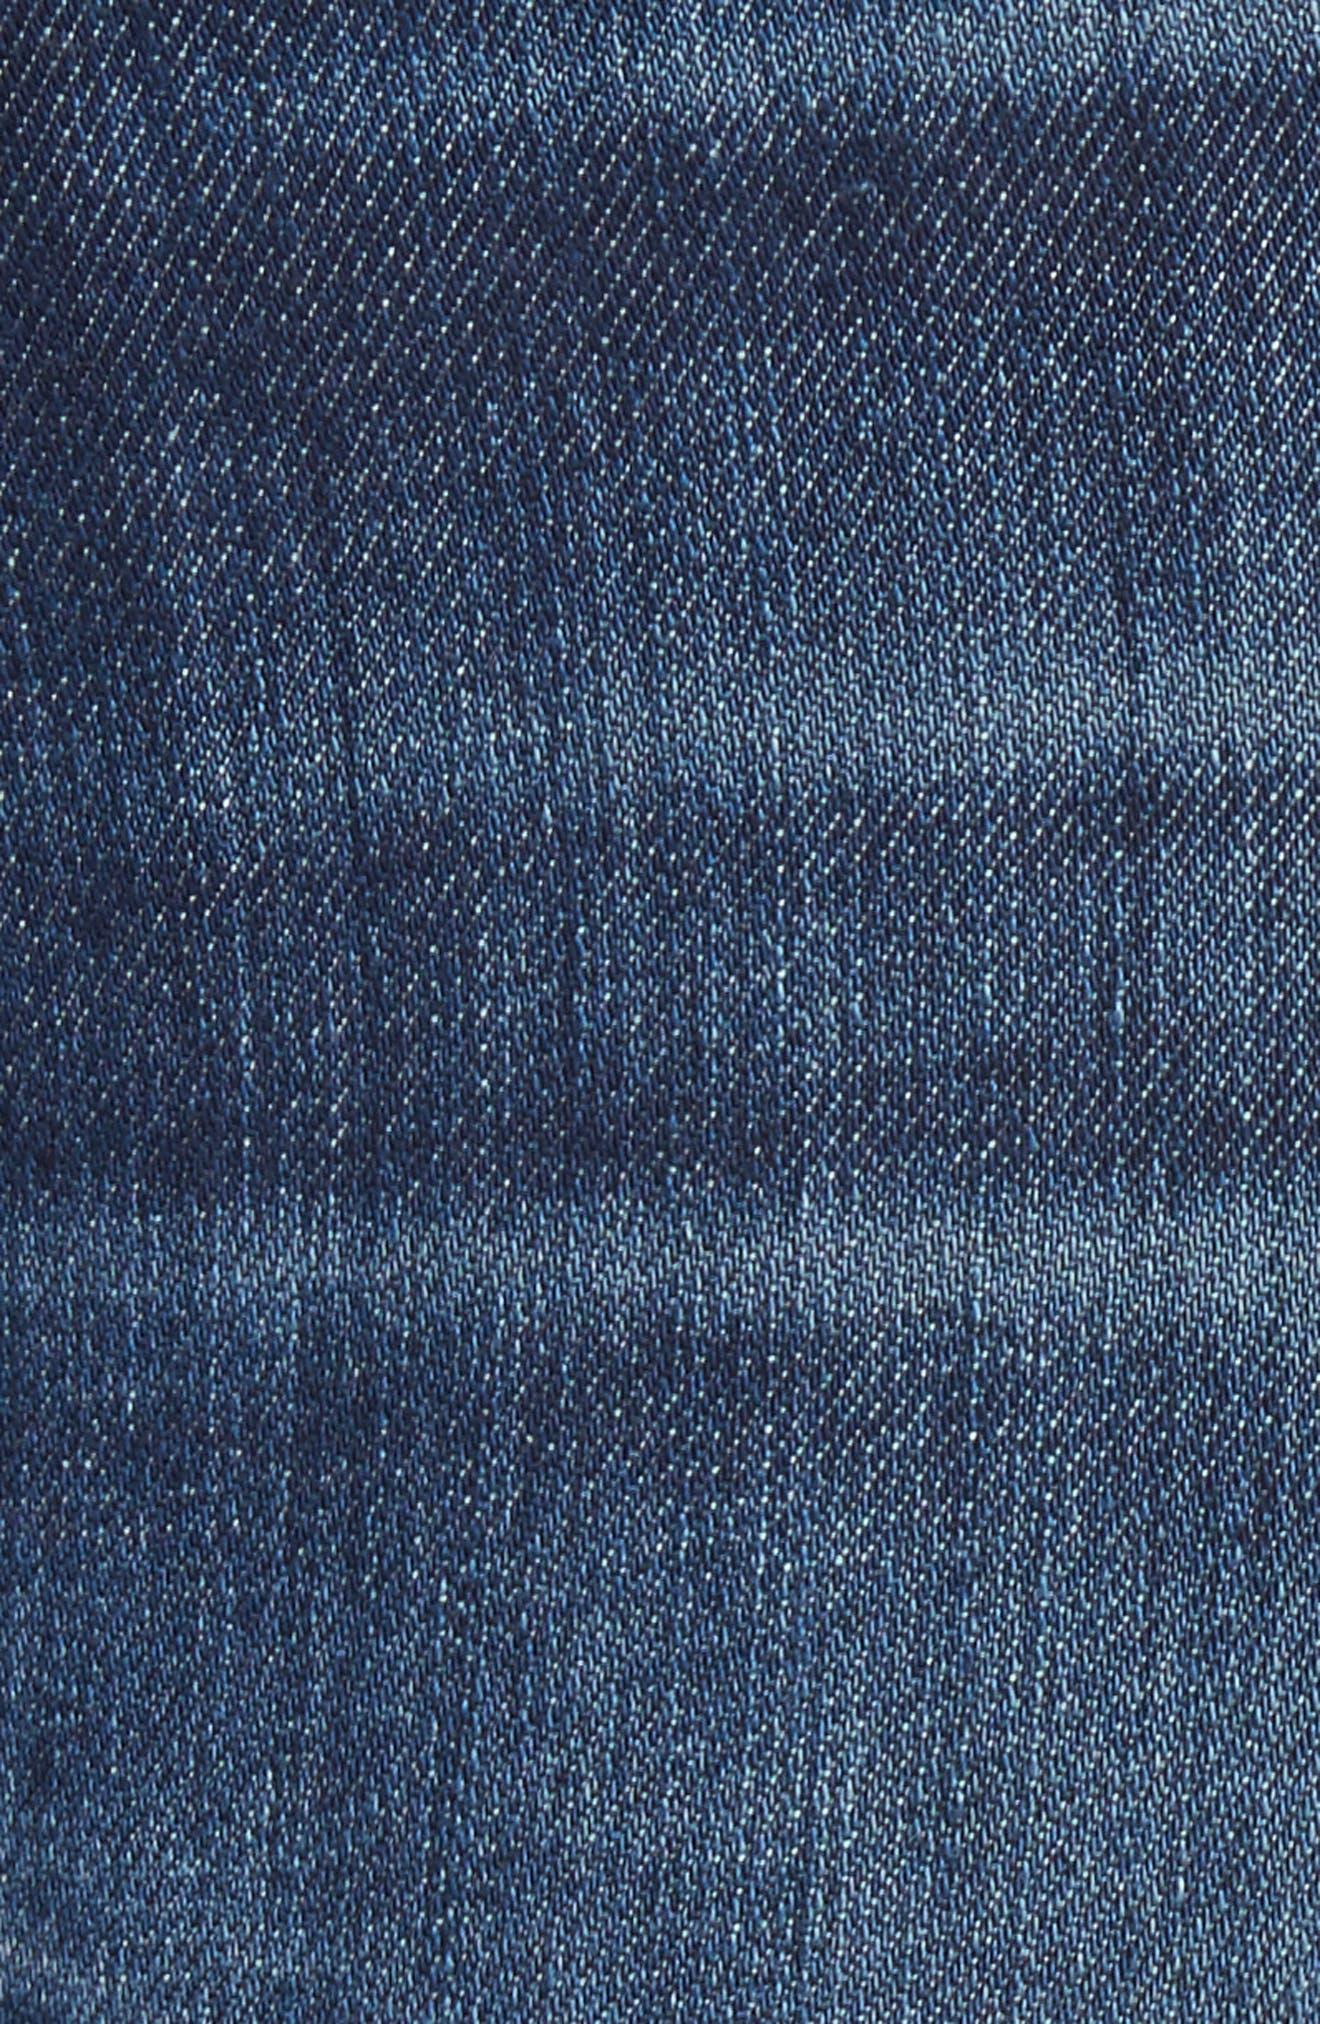 Nico Super Skinny Jeans,                             Alternate thumbnail 13, color,